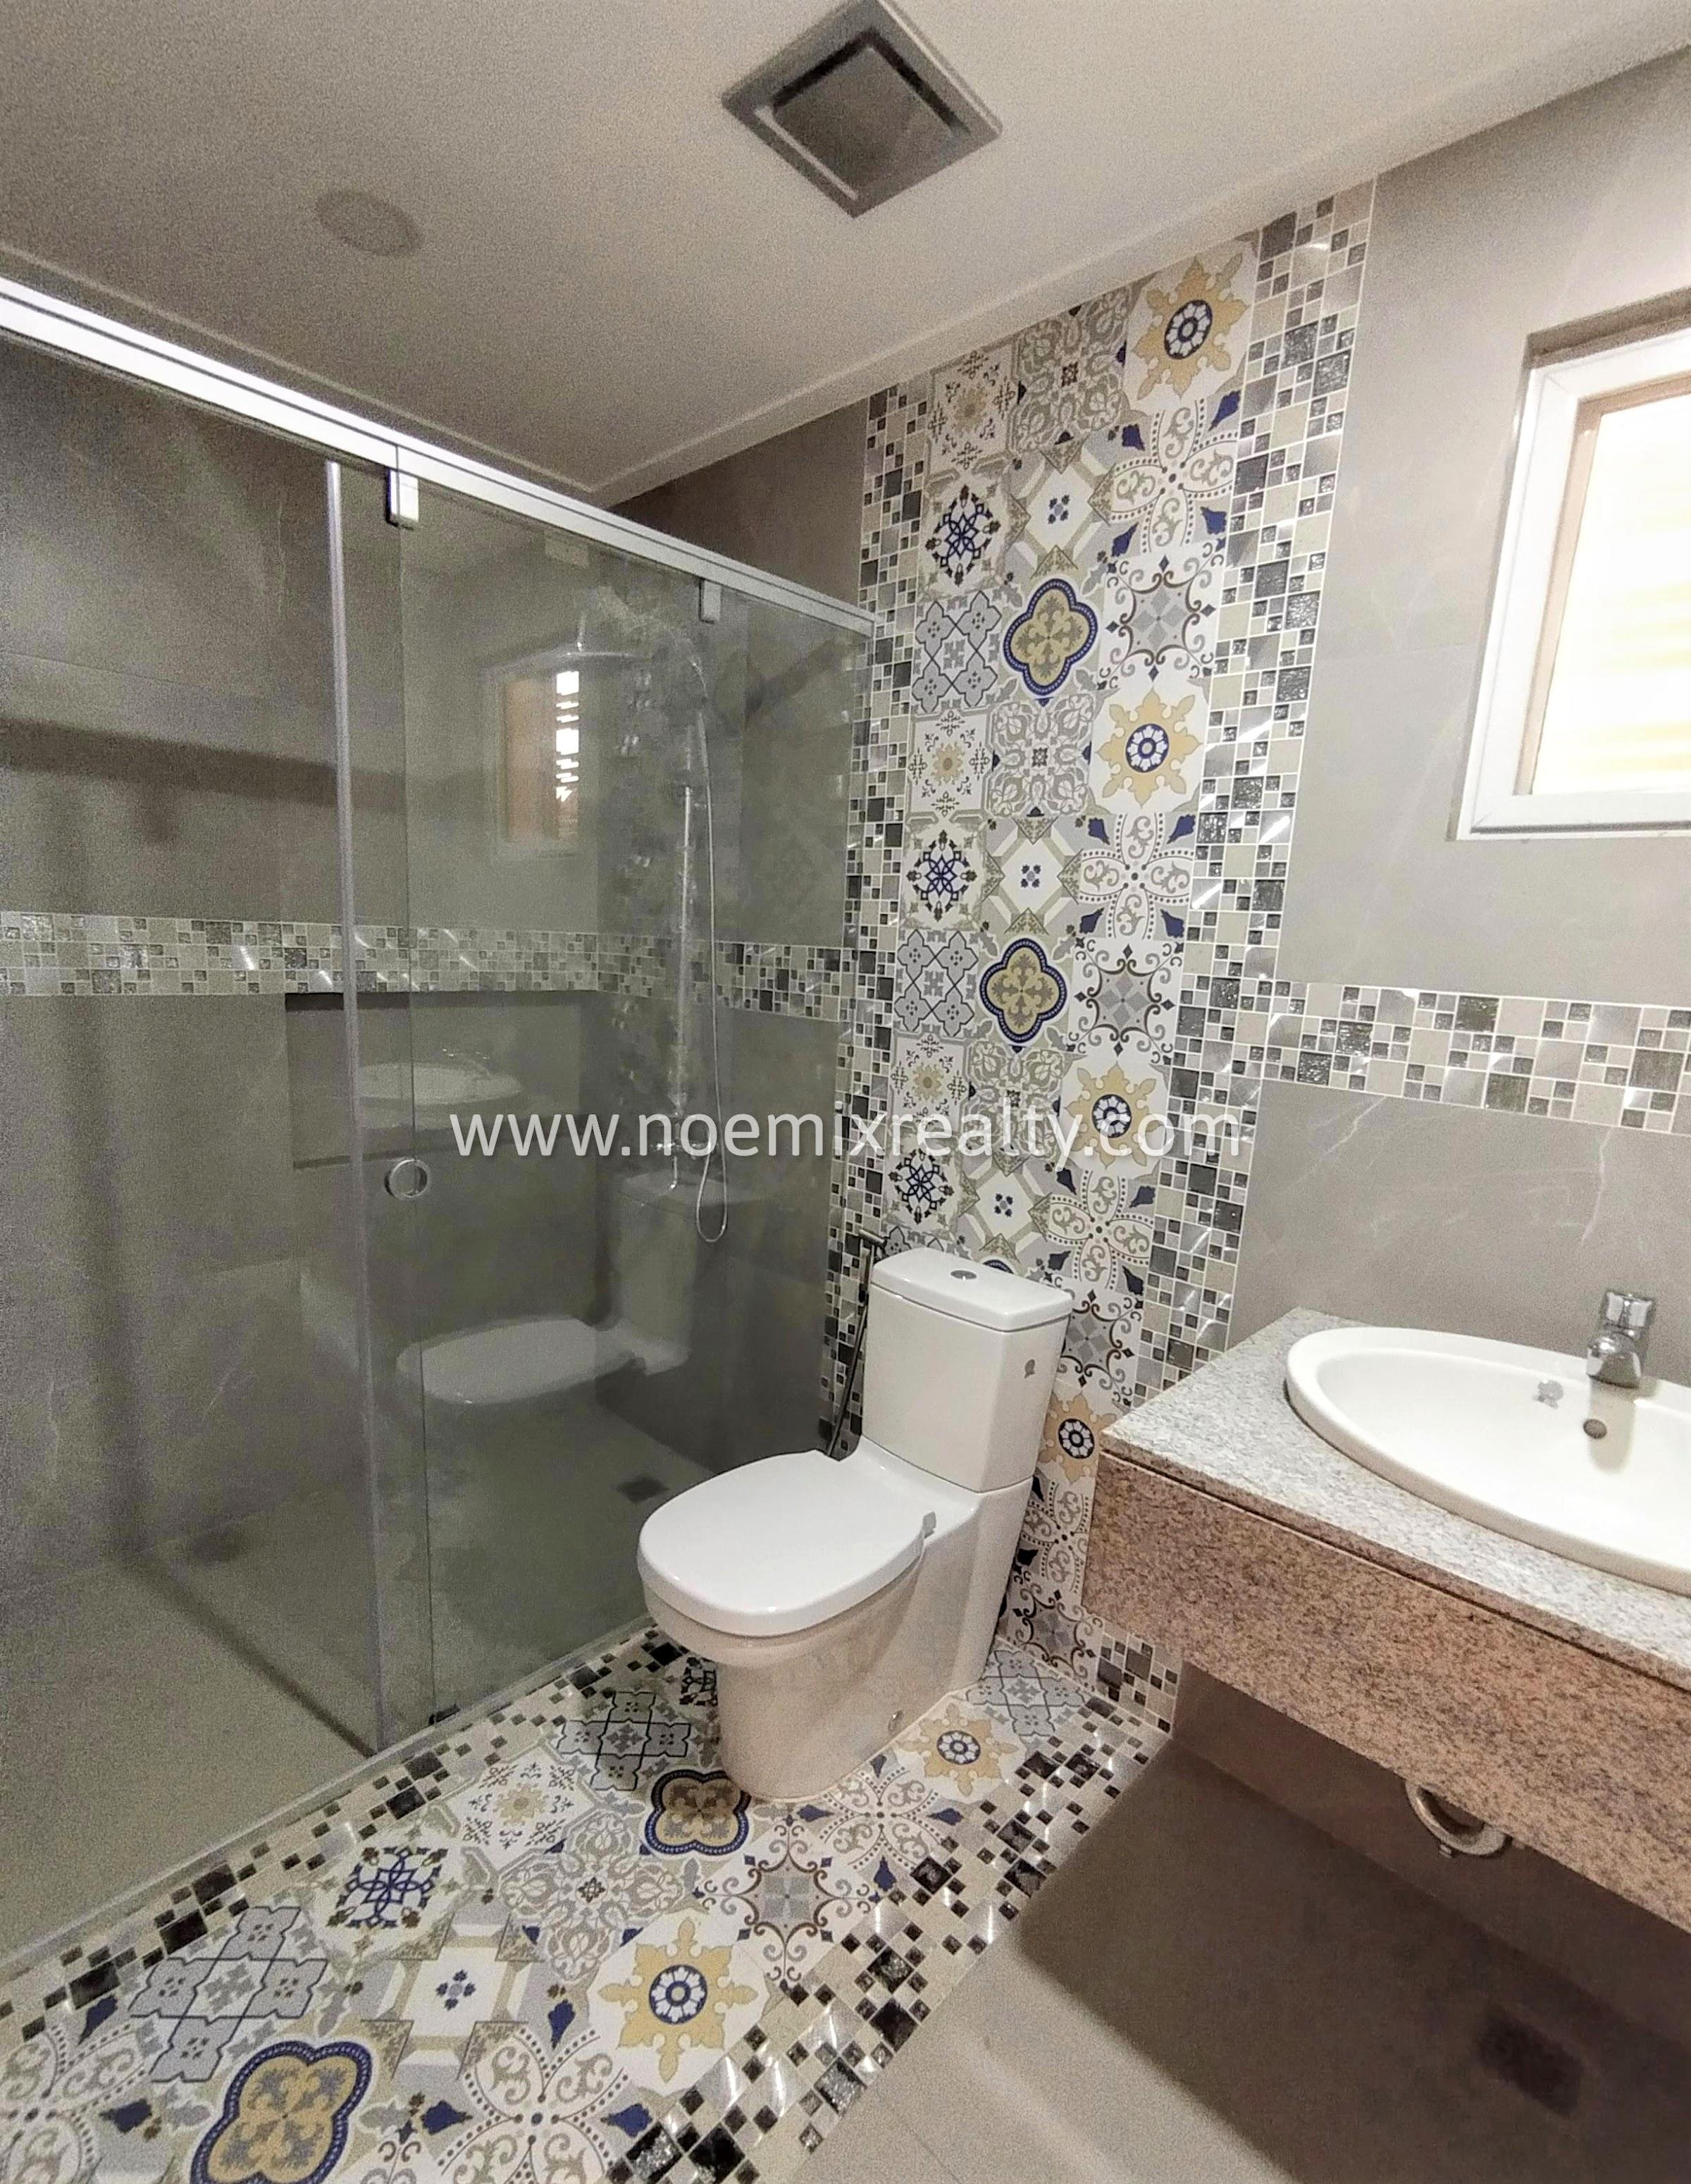 8 Bedroom Townhouse in Tandang Sora, Mindanao Avenue, Quezon City toilet and bath